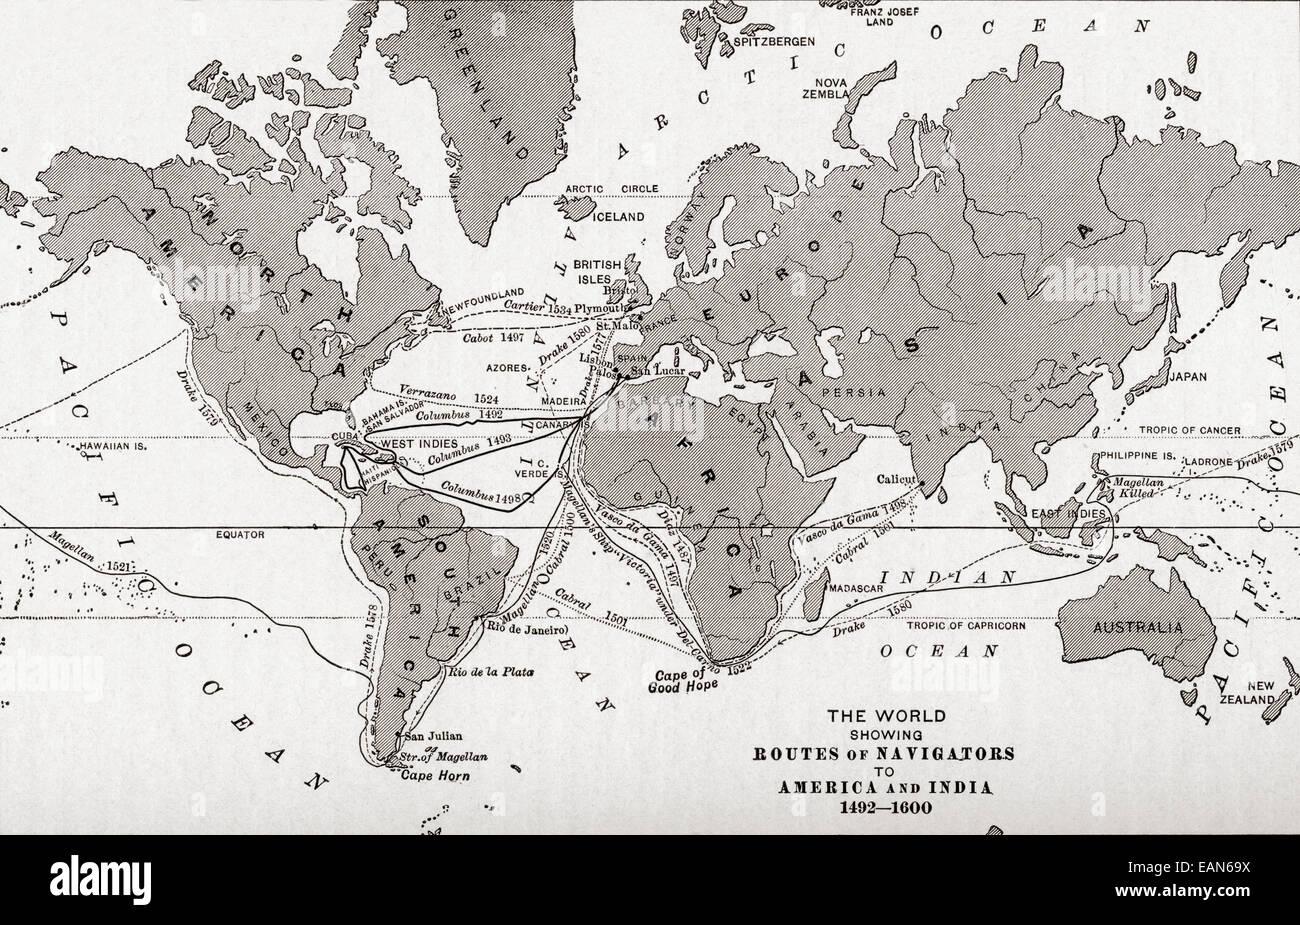 Map Of The World 1600 Stockfotos & Map Of The World 1600 Bilder - Alamy